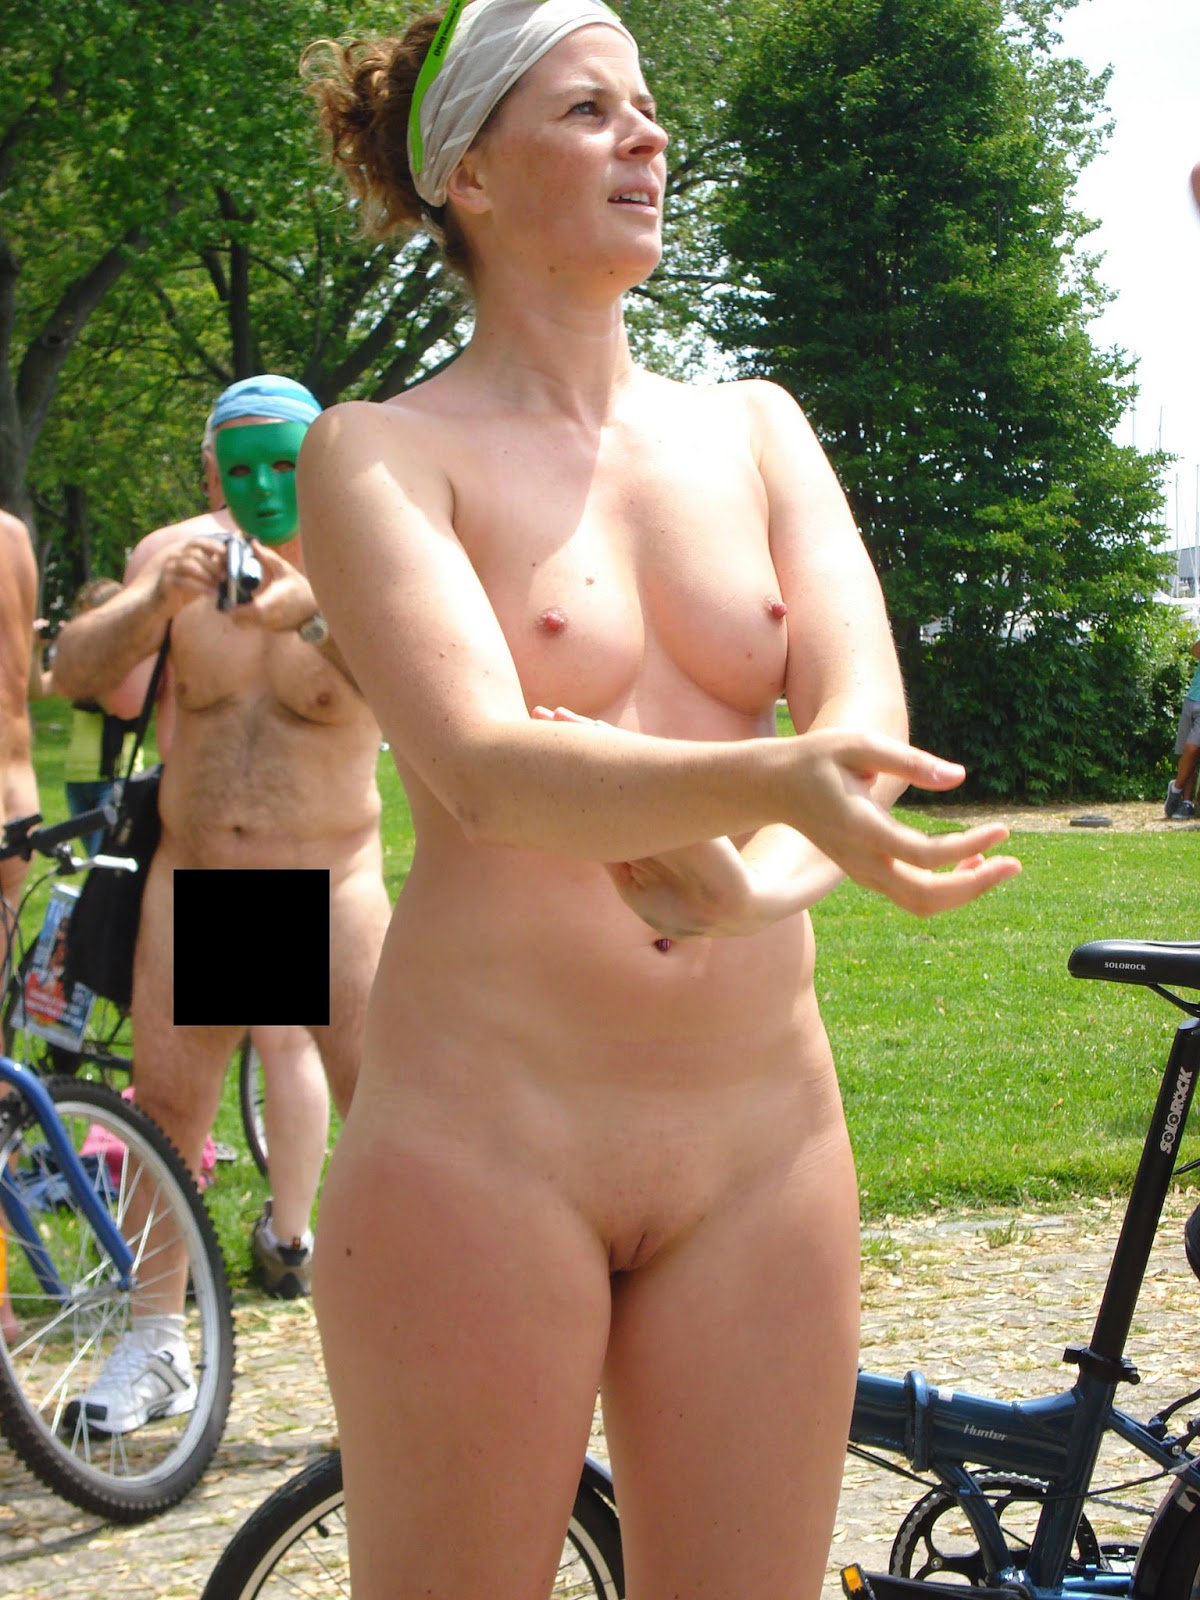 nude girl in public experiment